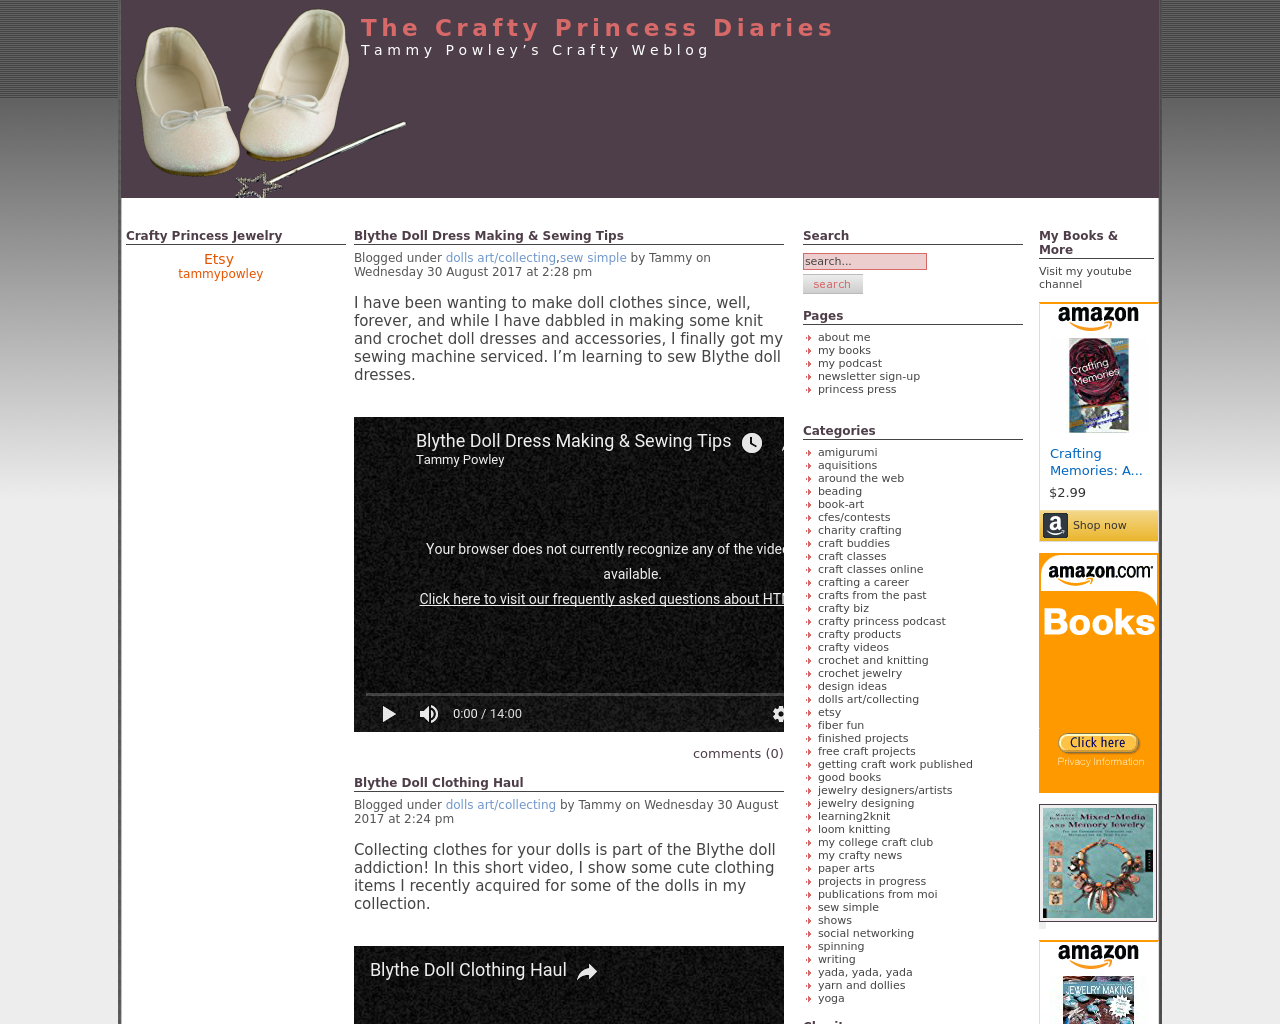 The-Crafty-Princess-Diaries-Advertising-Reviews-Pricing